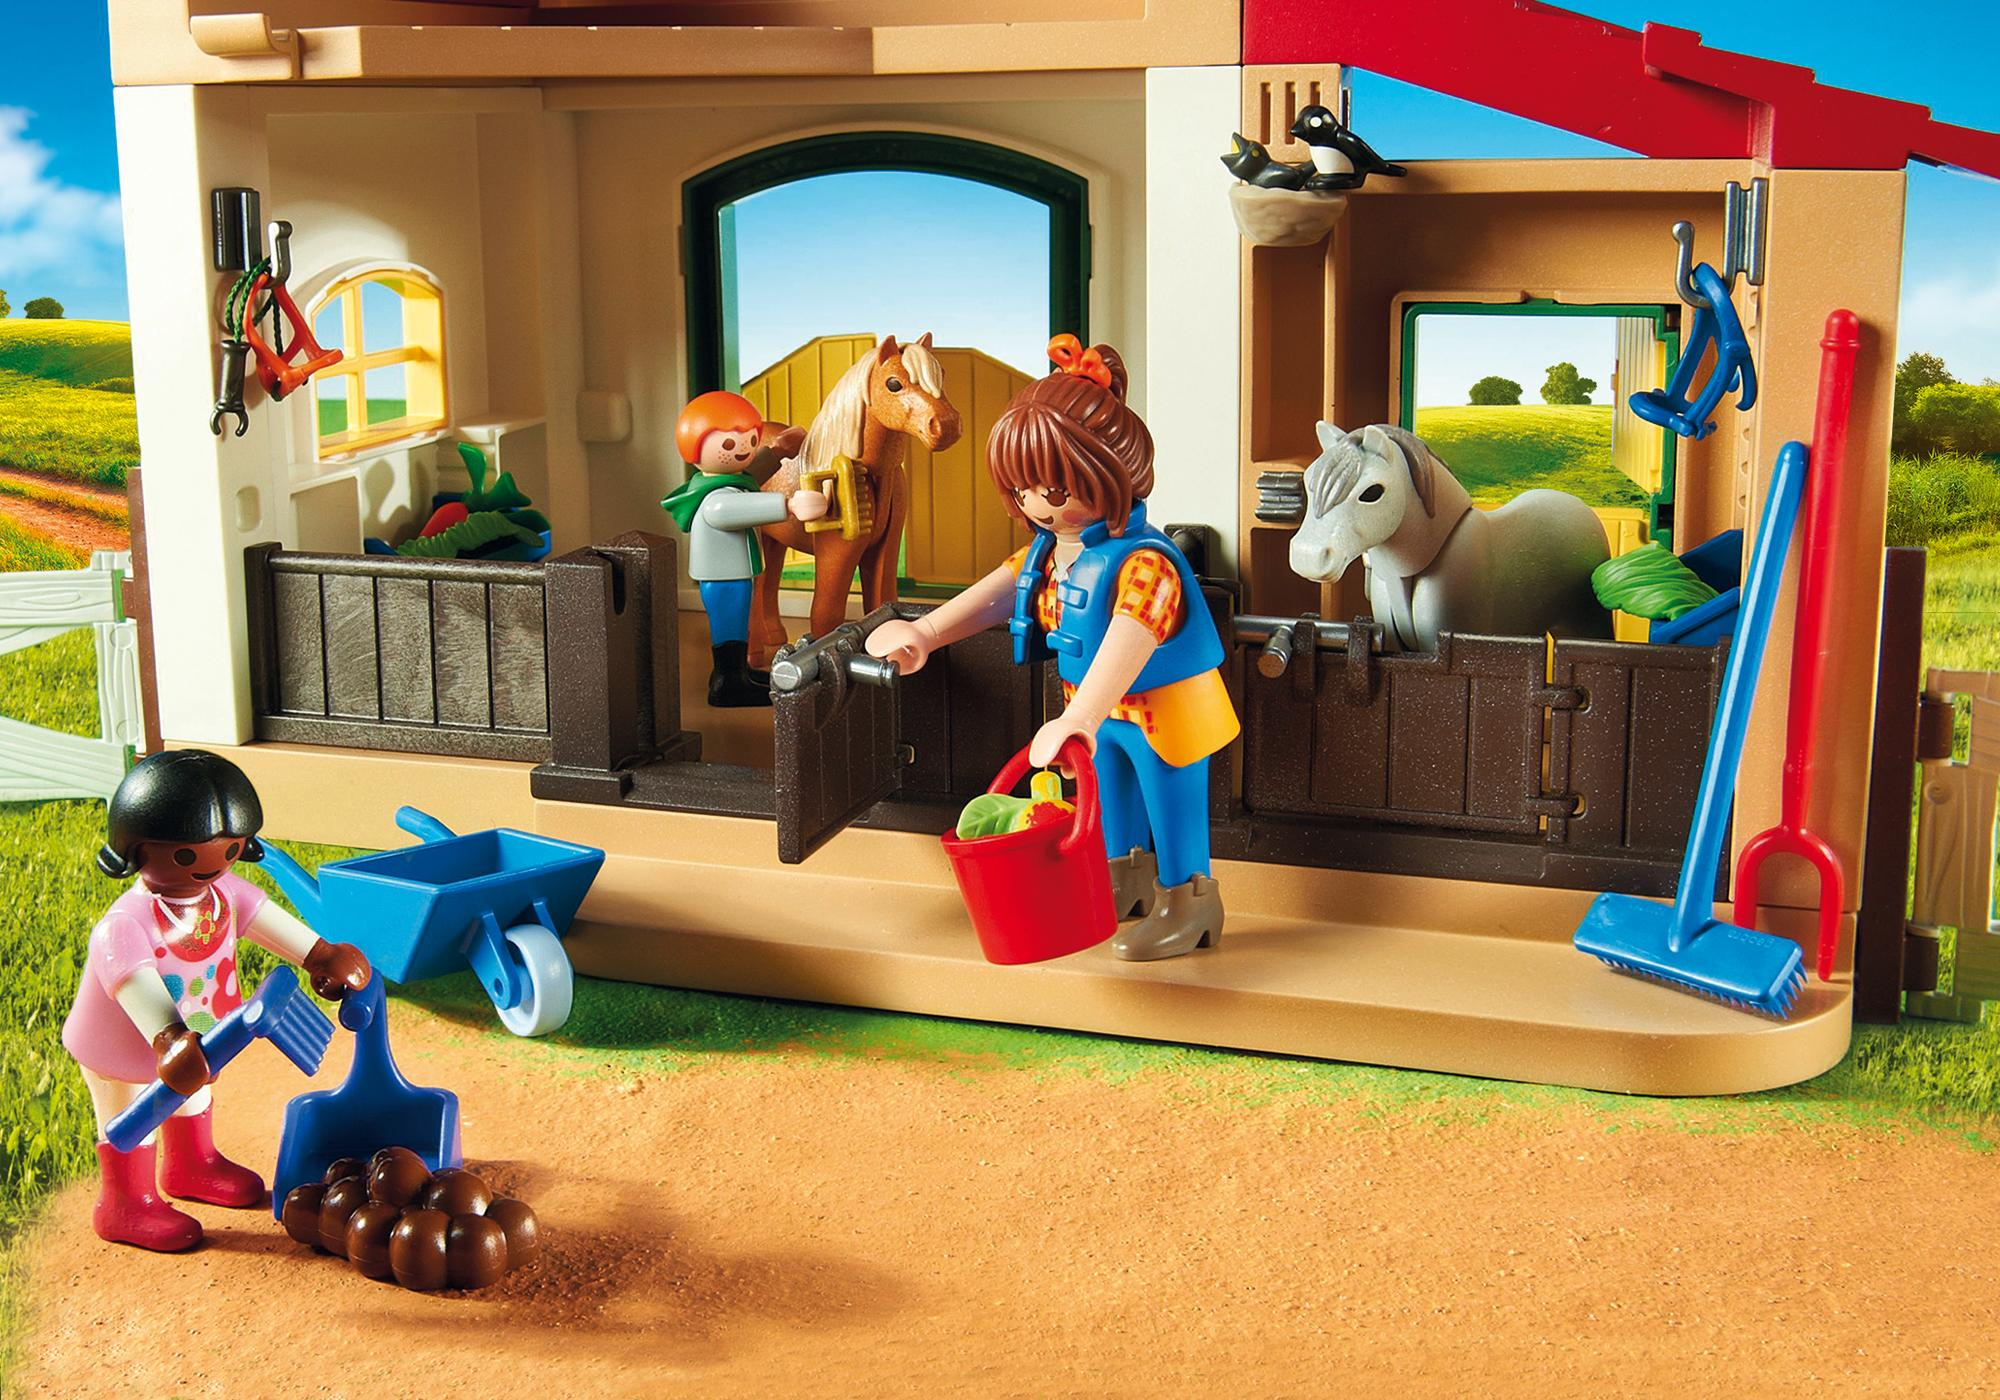 http://media.playmobil.com/i/playmobil/6927_product_extra3